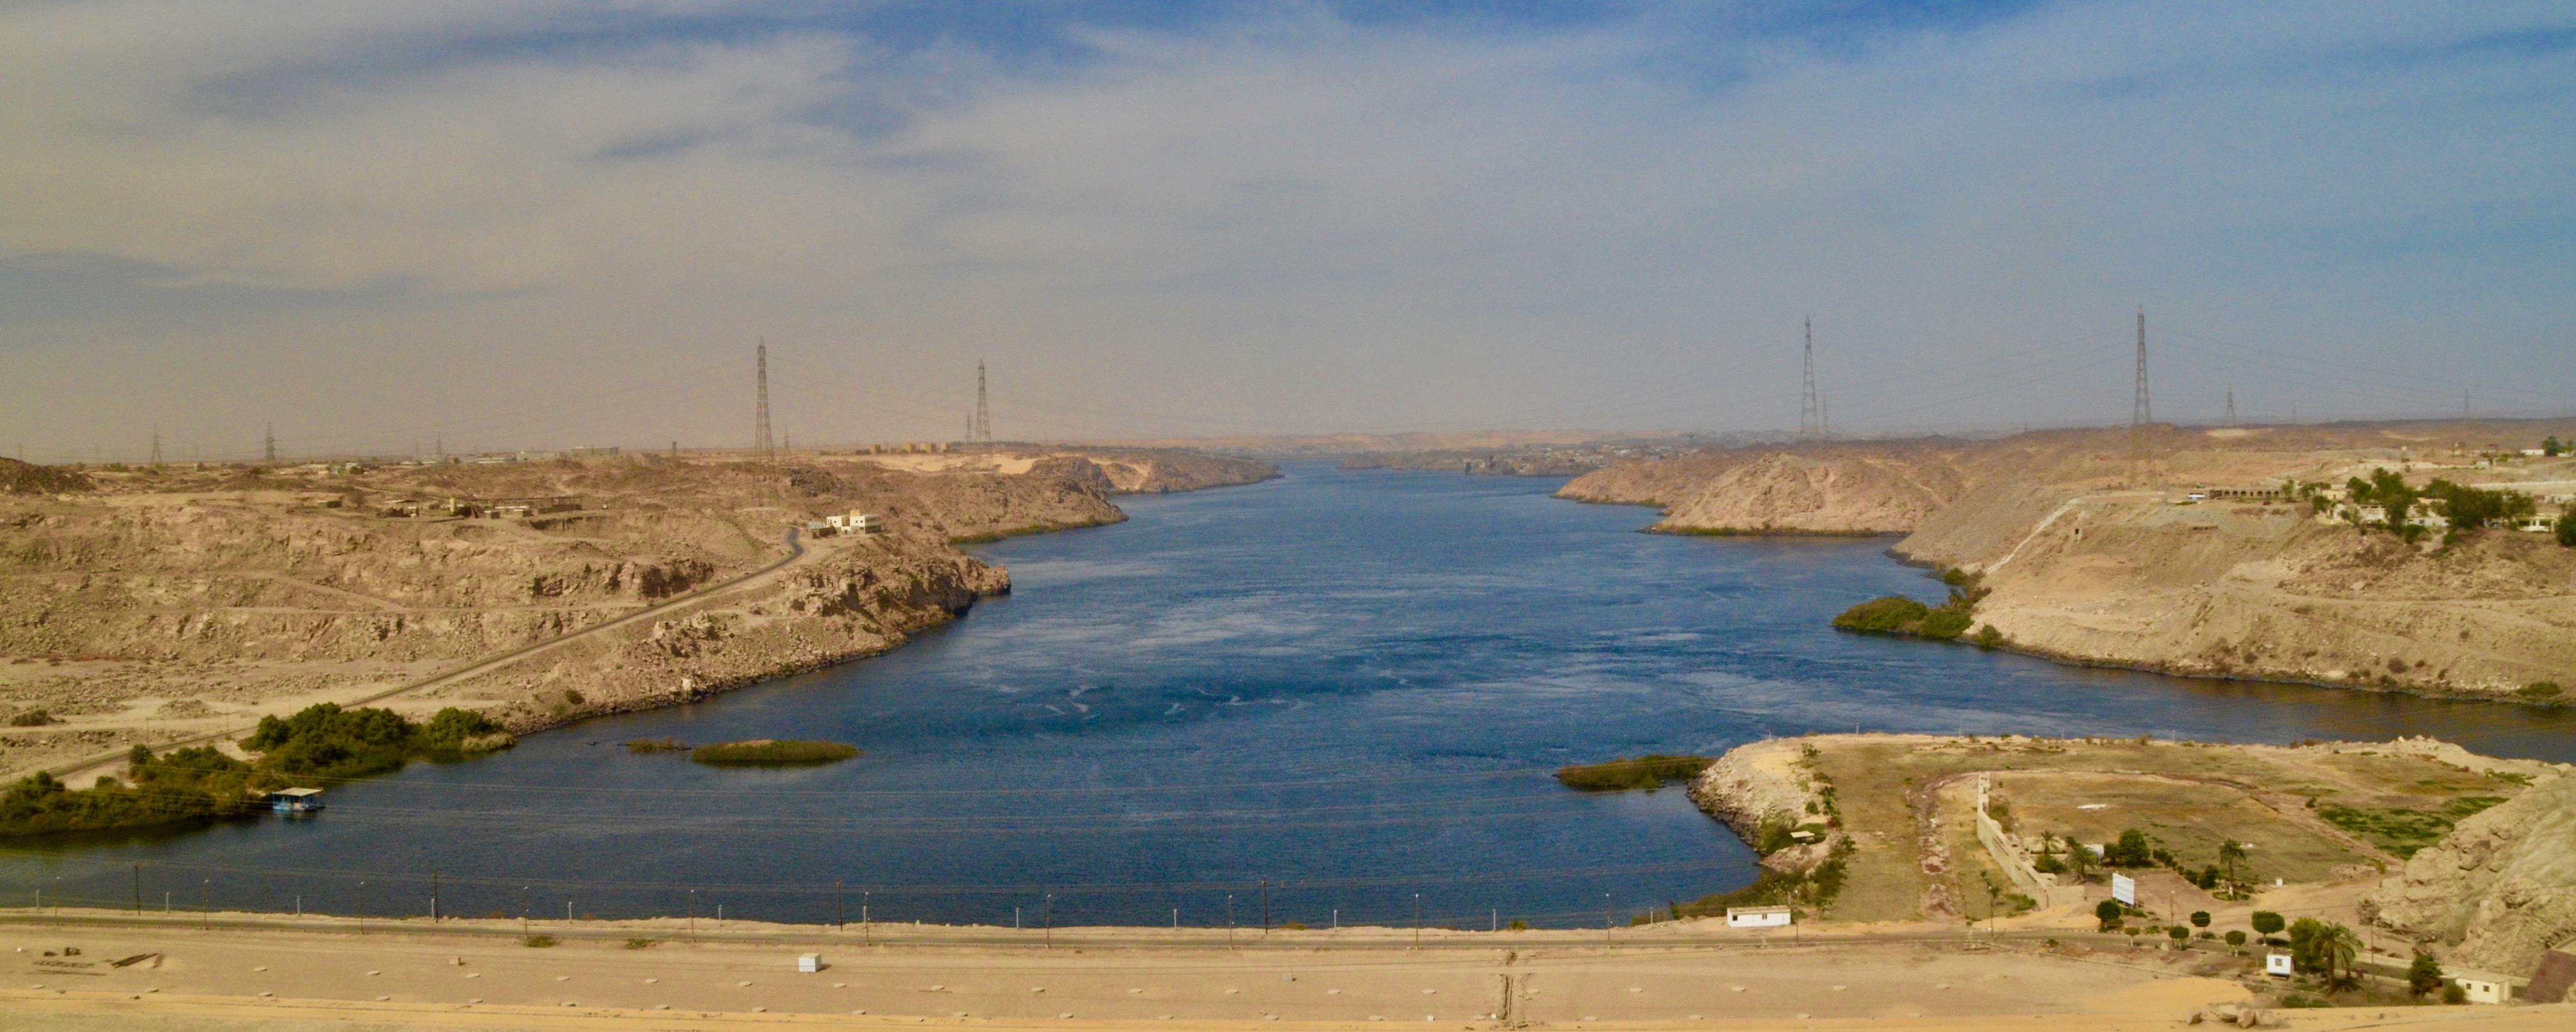 Below the High Dam, Aswan